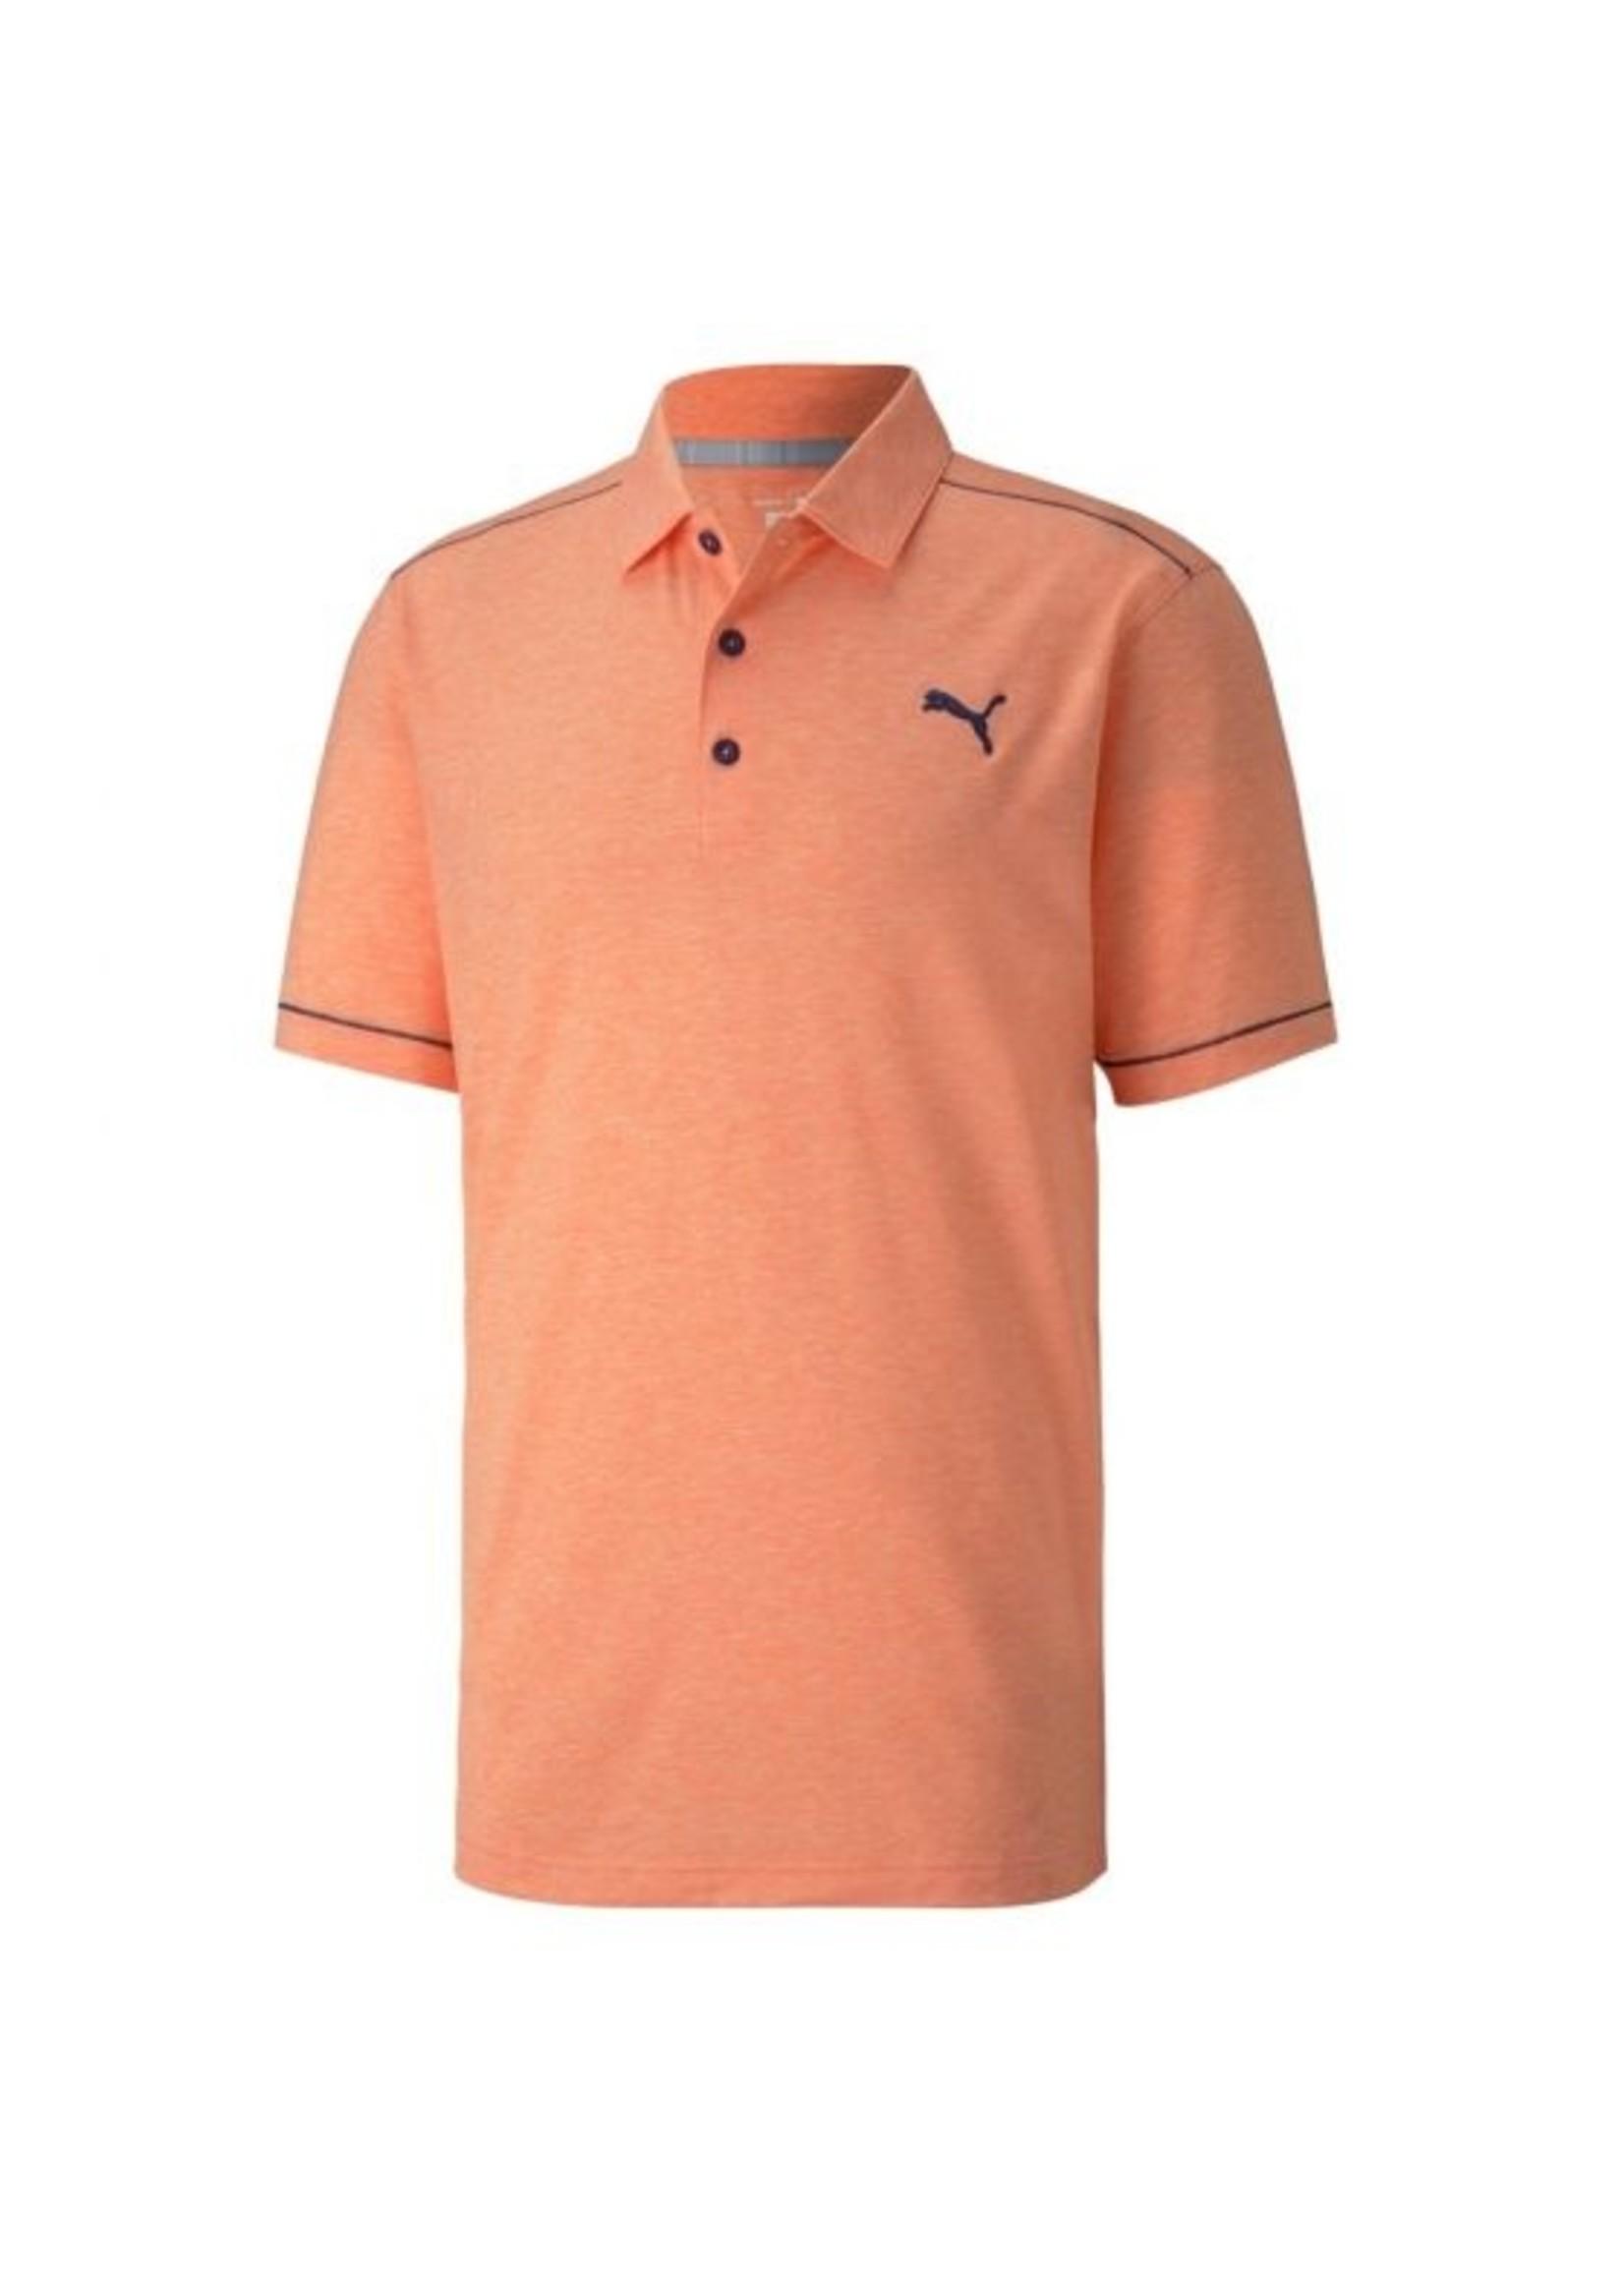 PUMA Rancho Polo Golf Shirt Mens